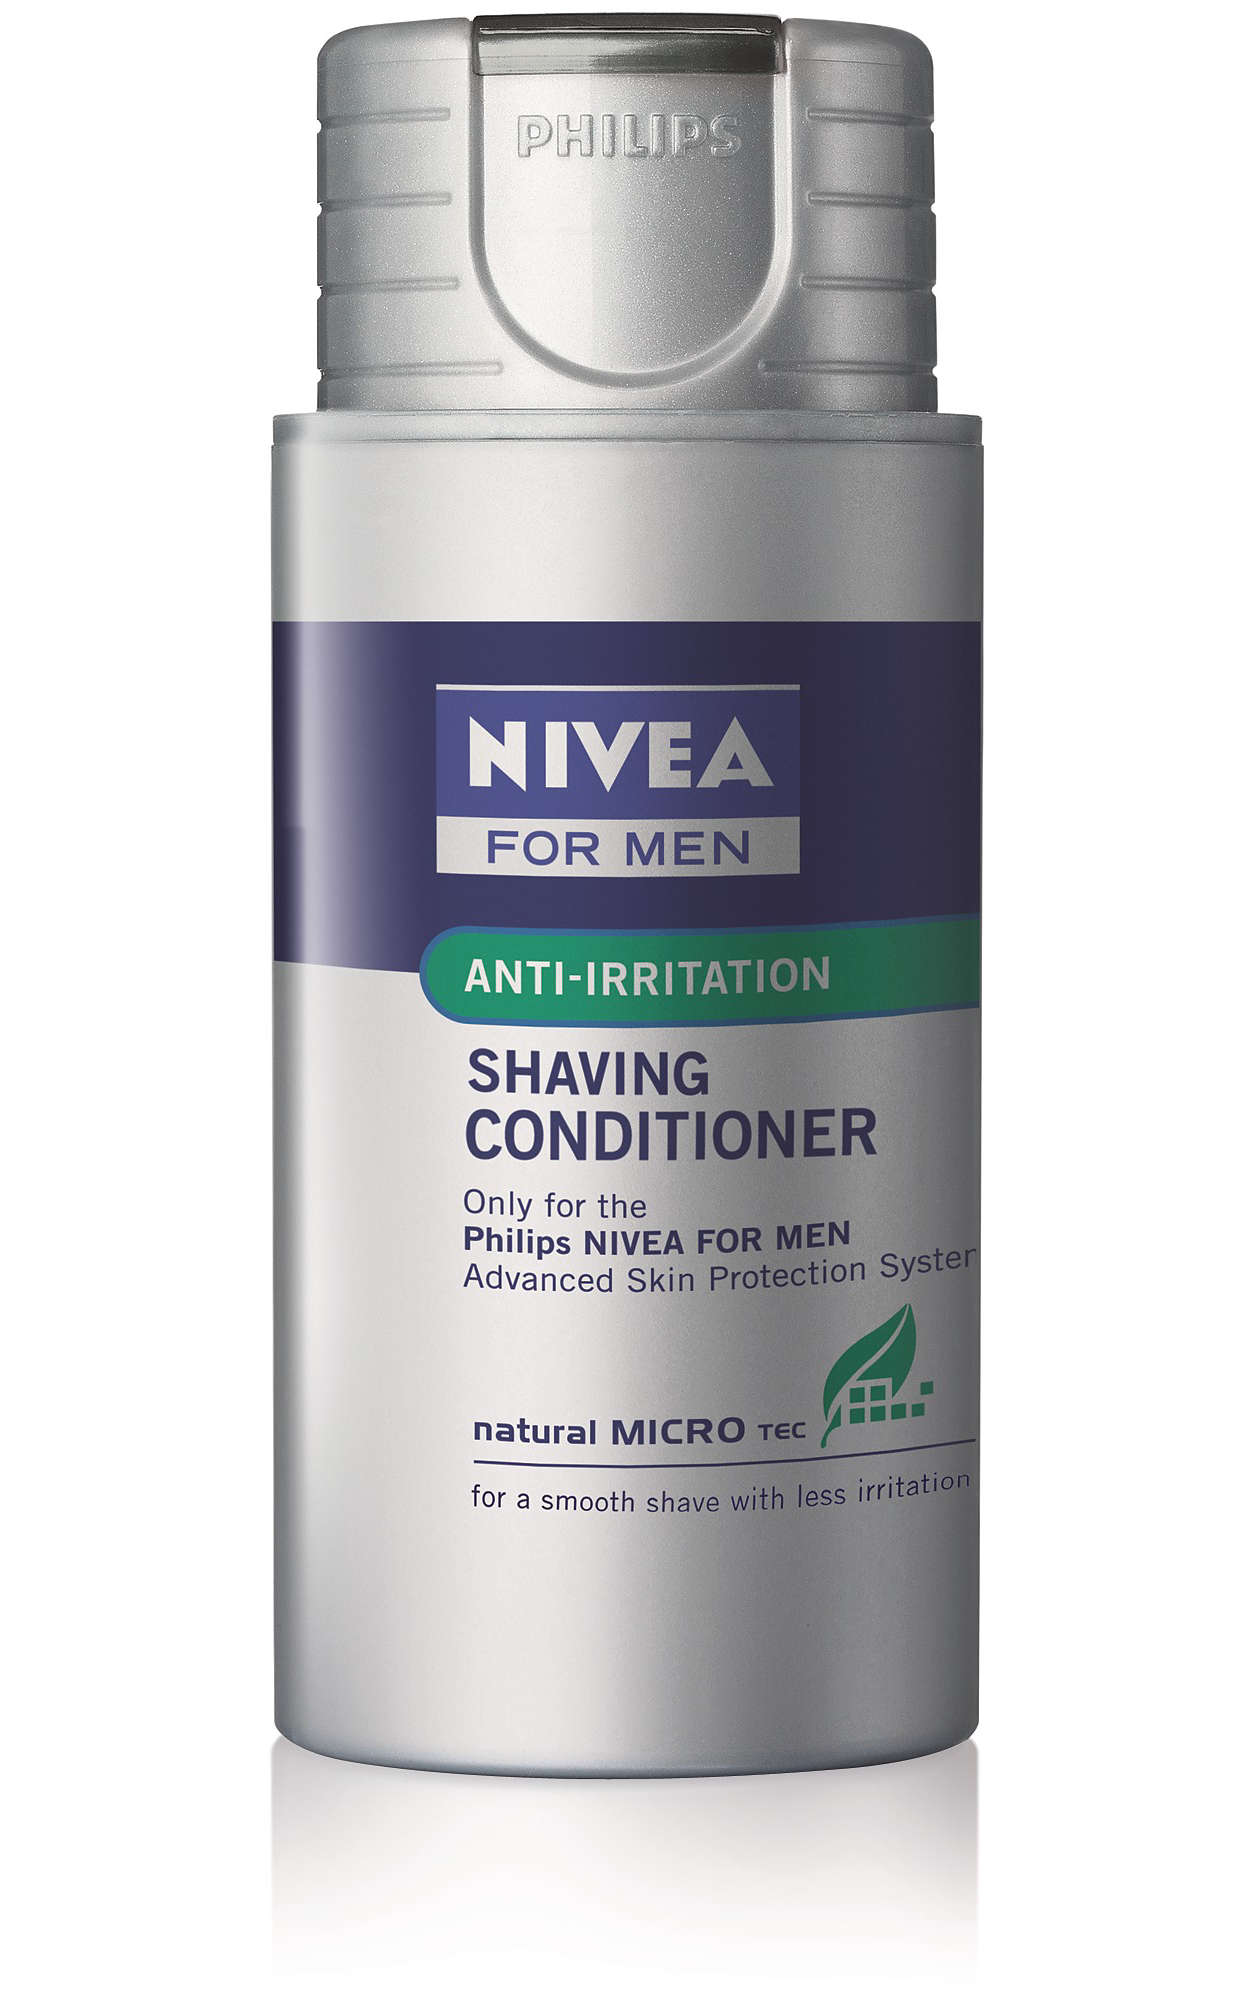 Moisturizing shaving conditioner